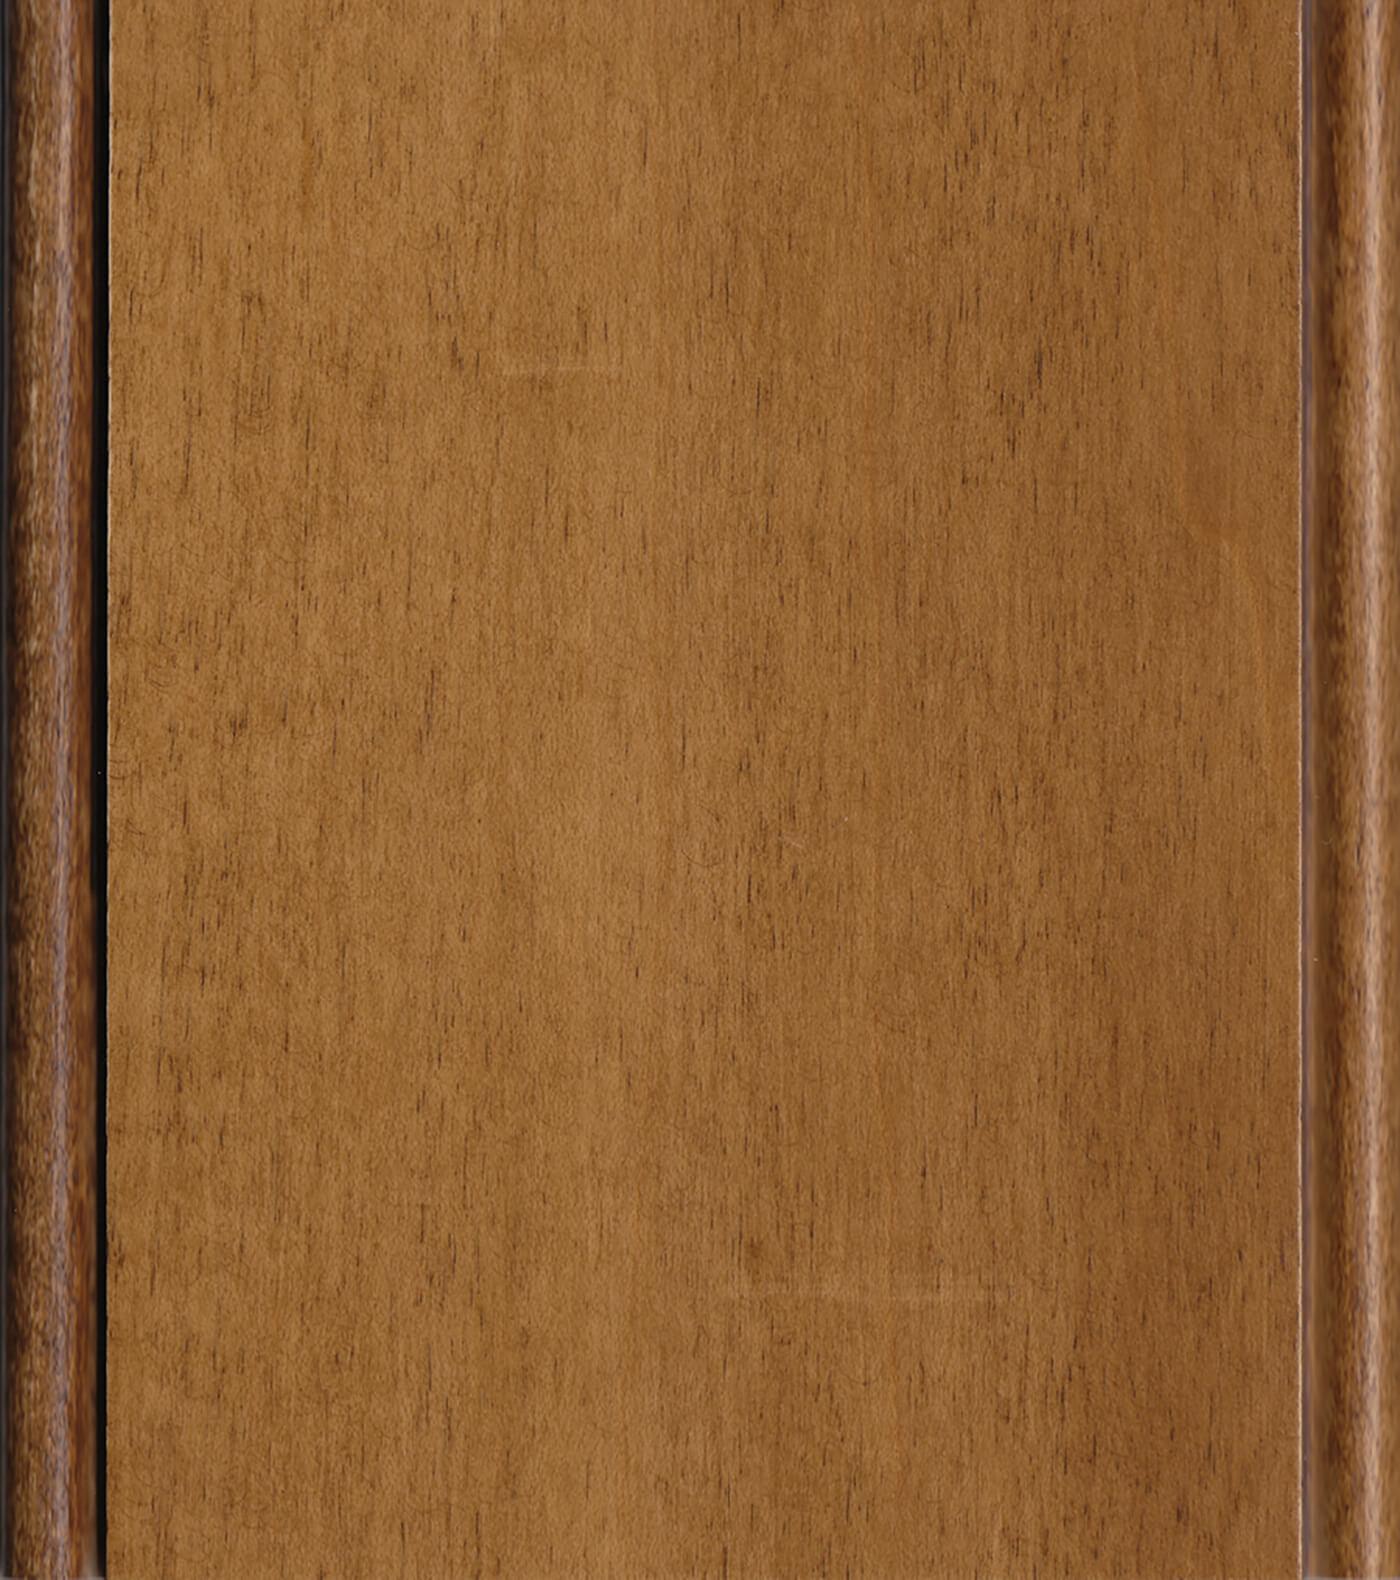 Clove Stain on Maple